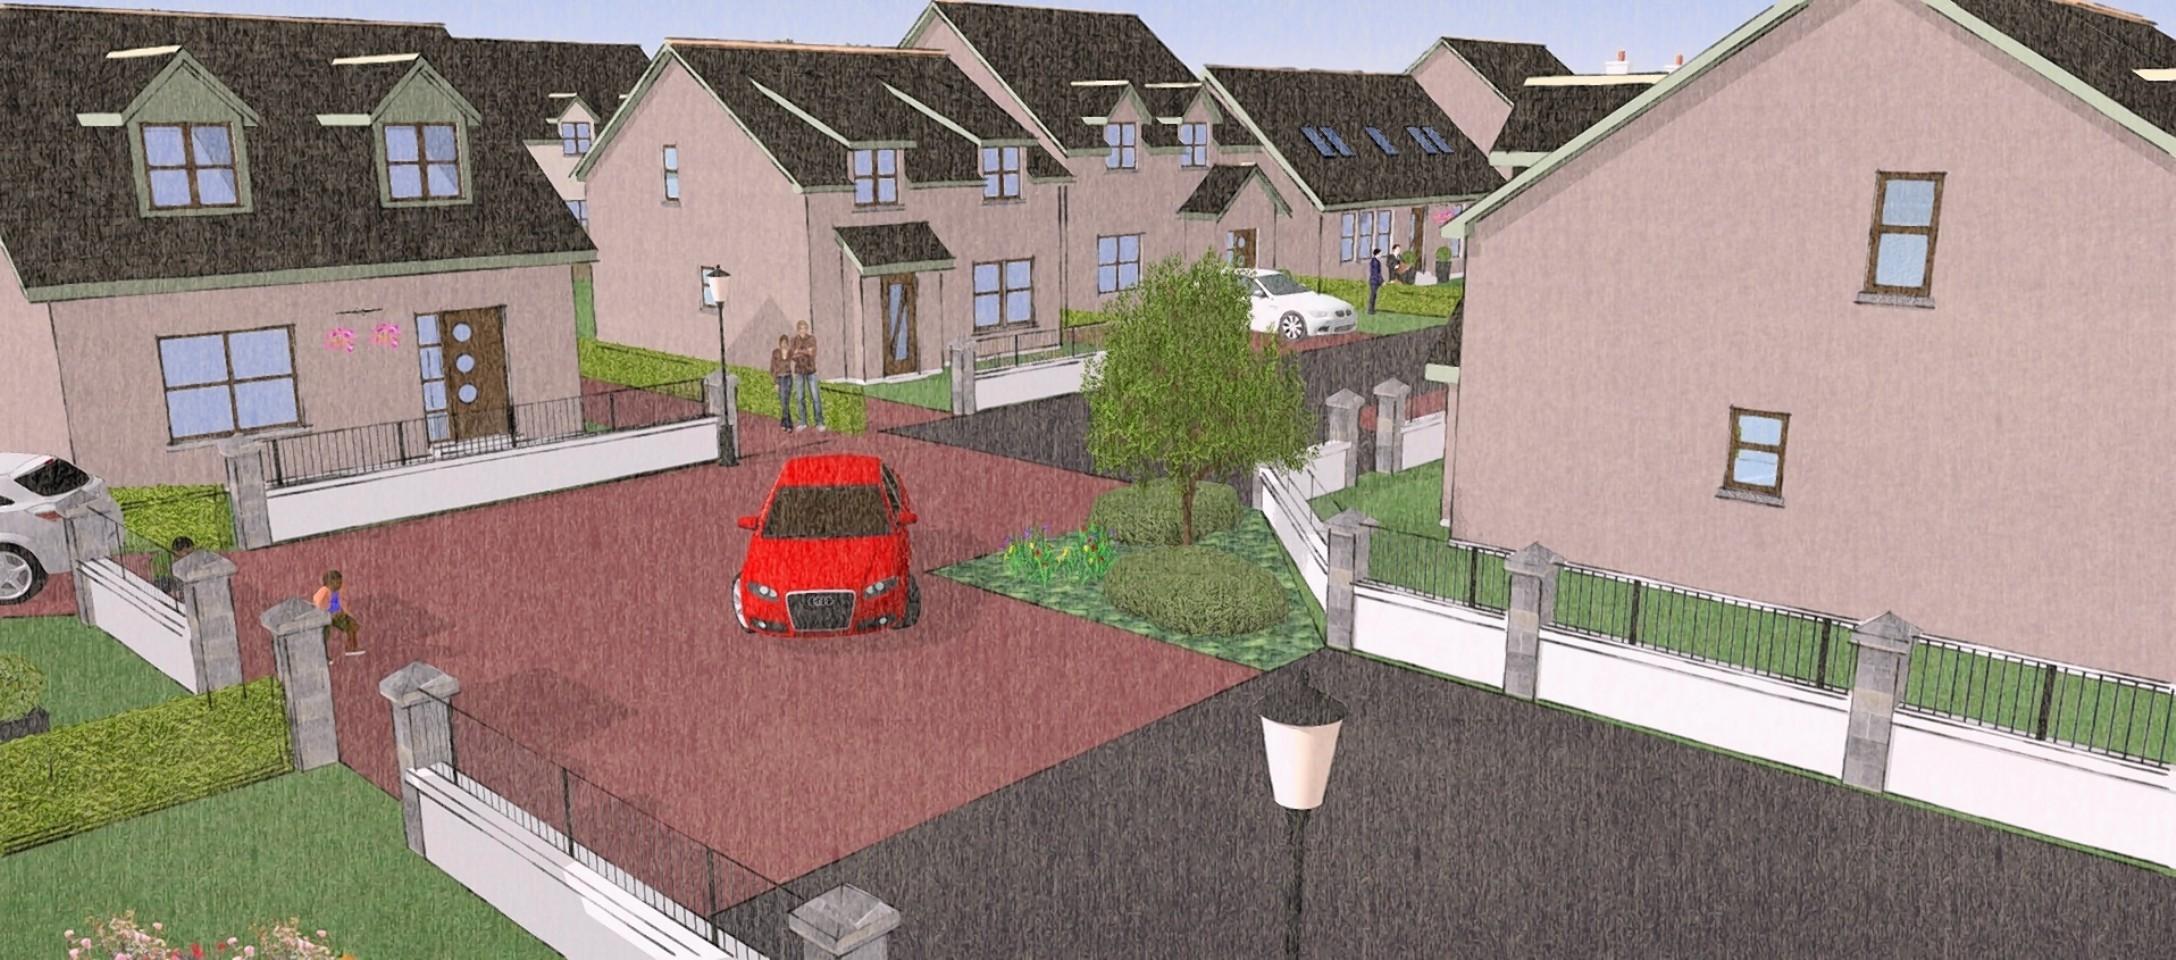 Artist impression of part of the Fraserburgh expansion plan